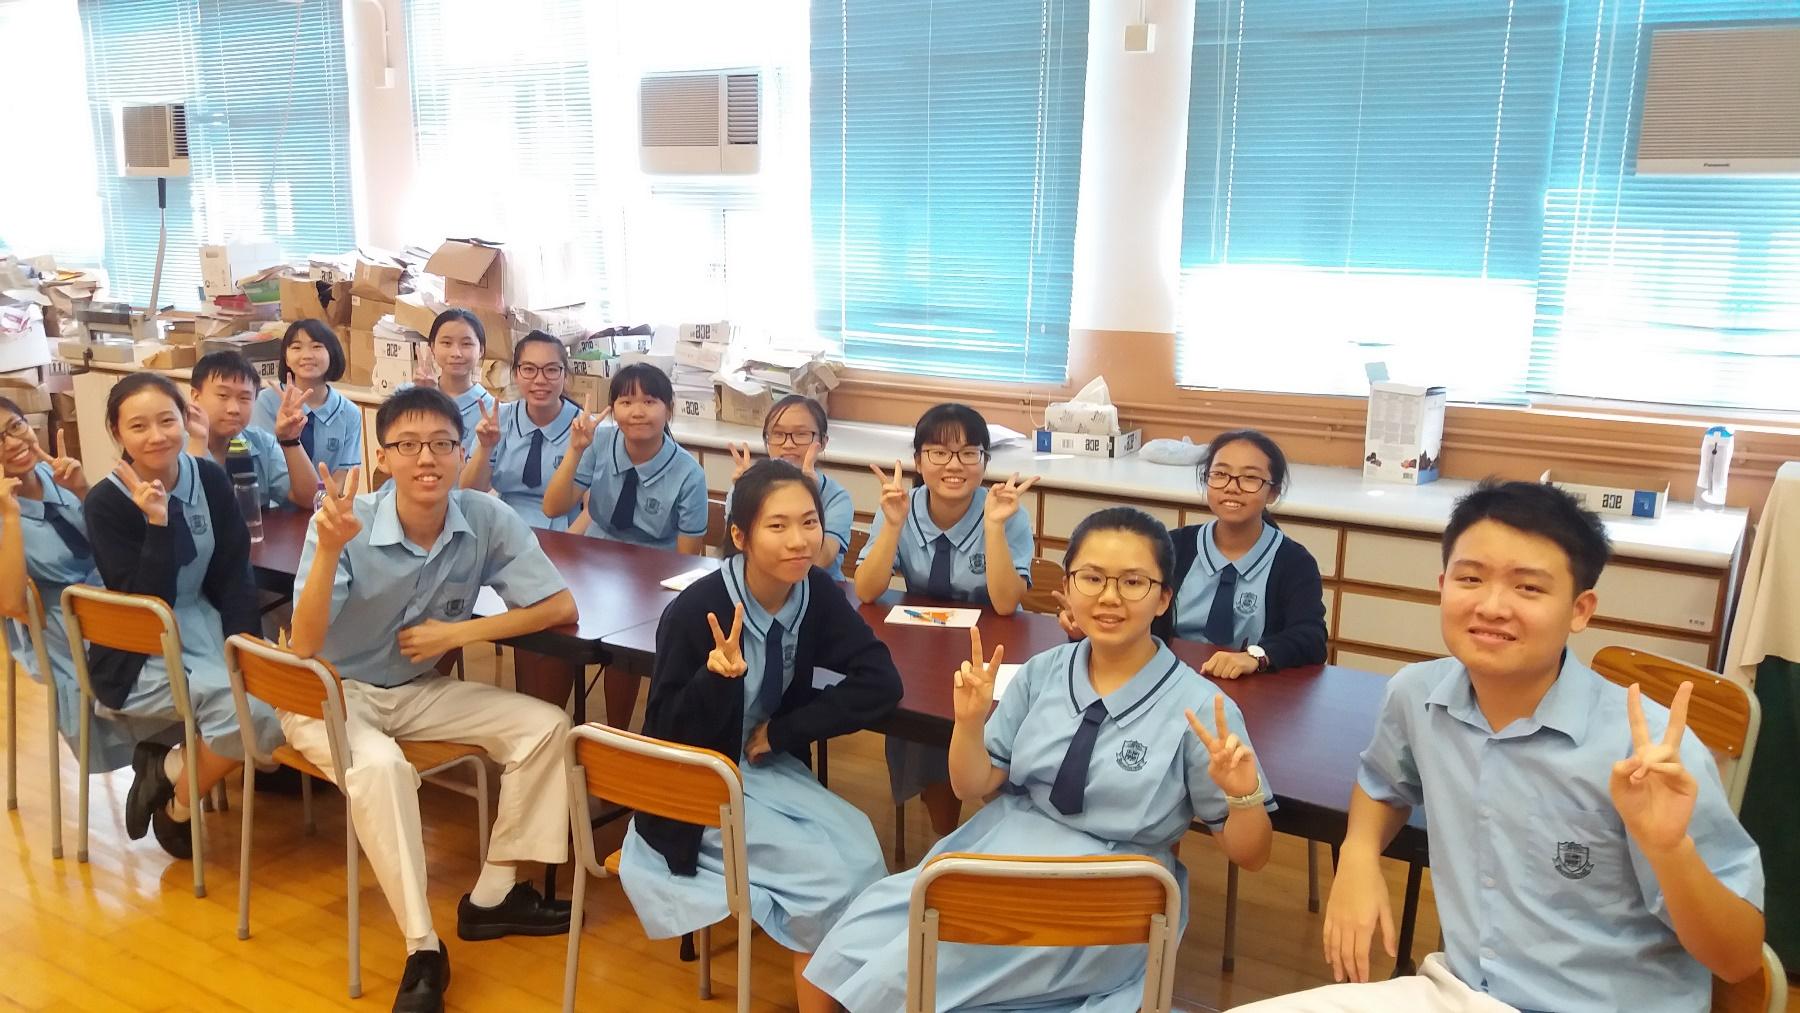 http://npc.edu.hk/sites/default/files/20180919_134510.jpg